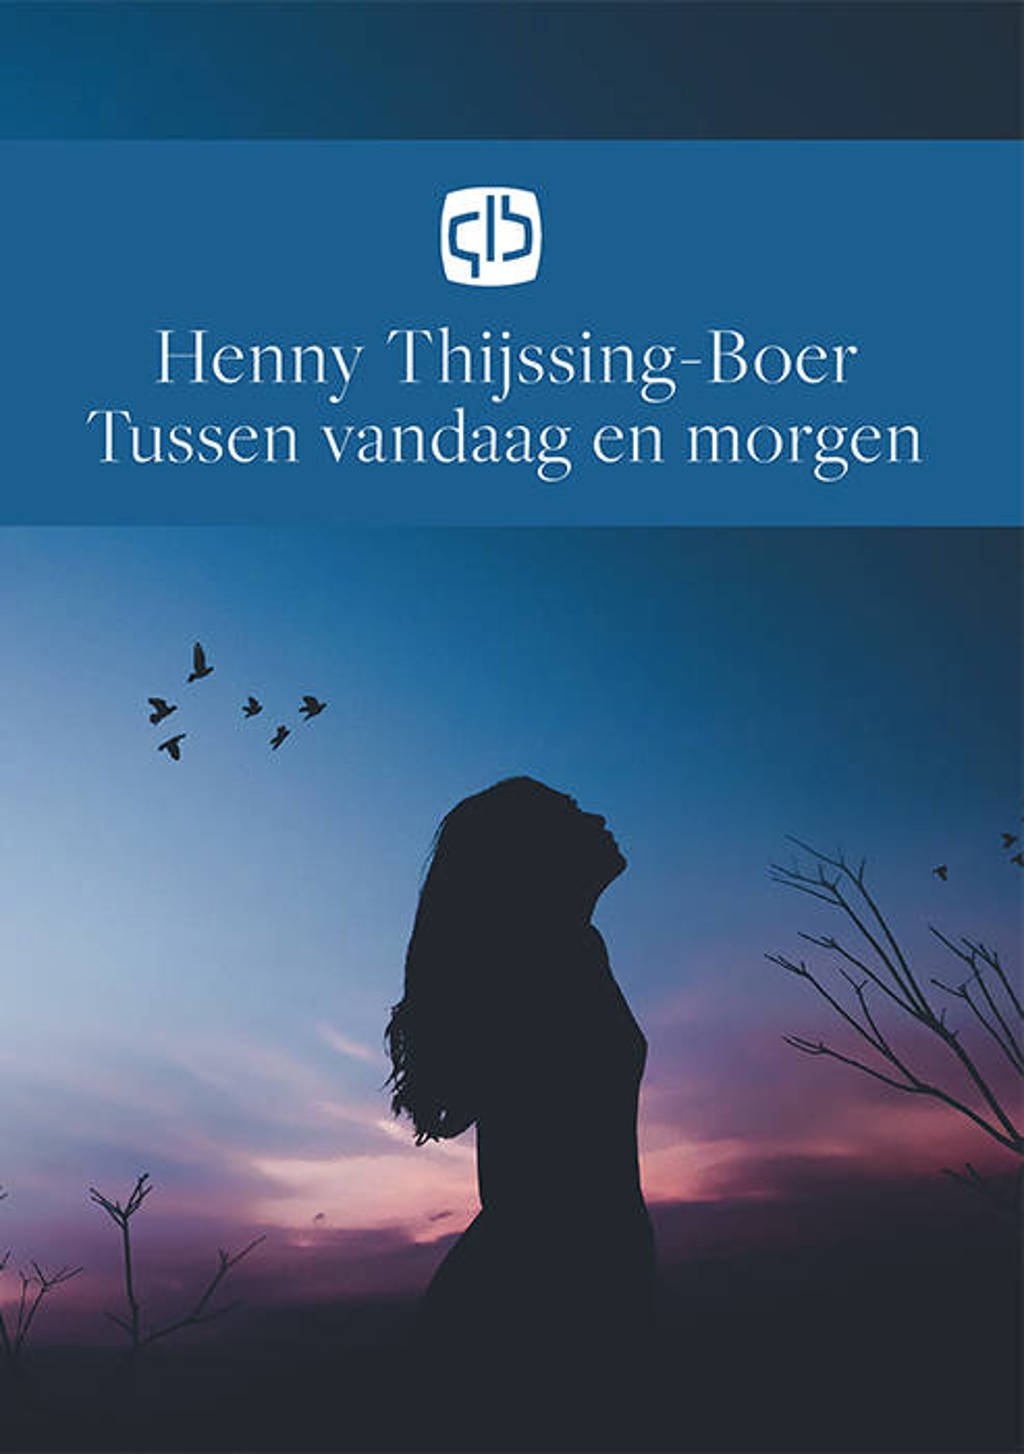 Tussen vandaag en morgen - Henny Thijssing-Boer